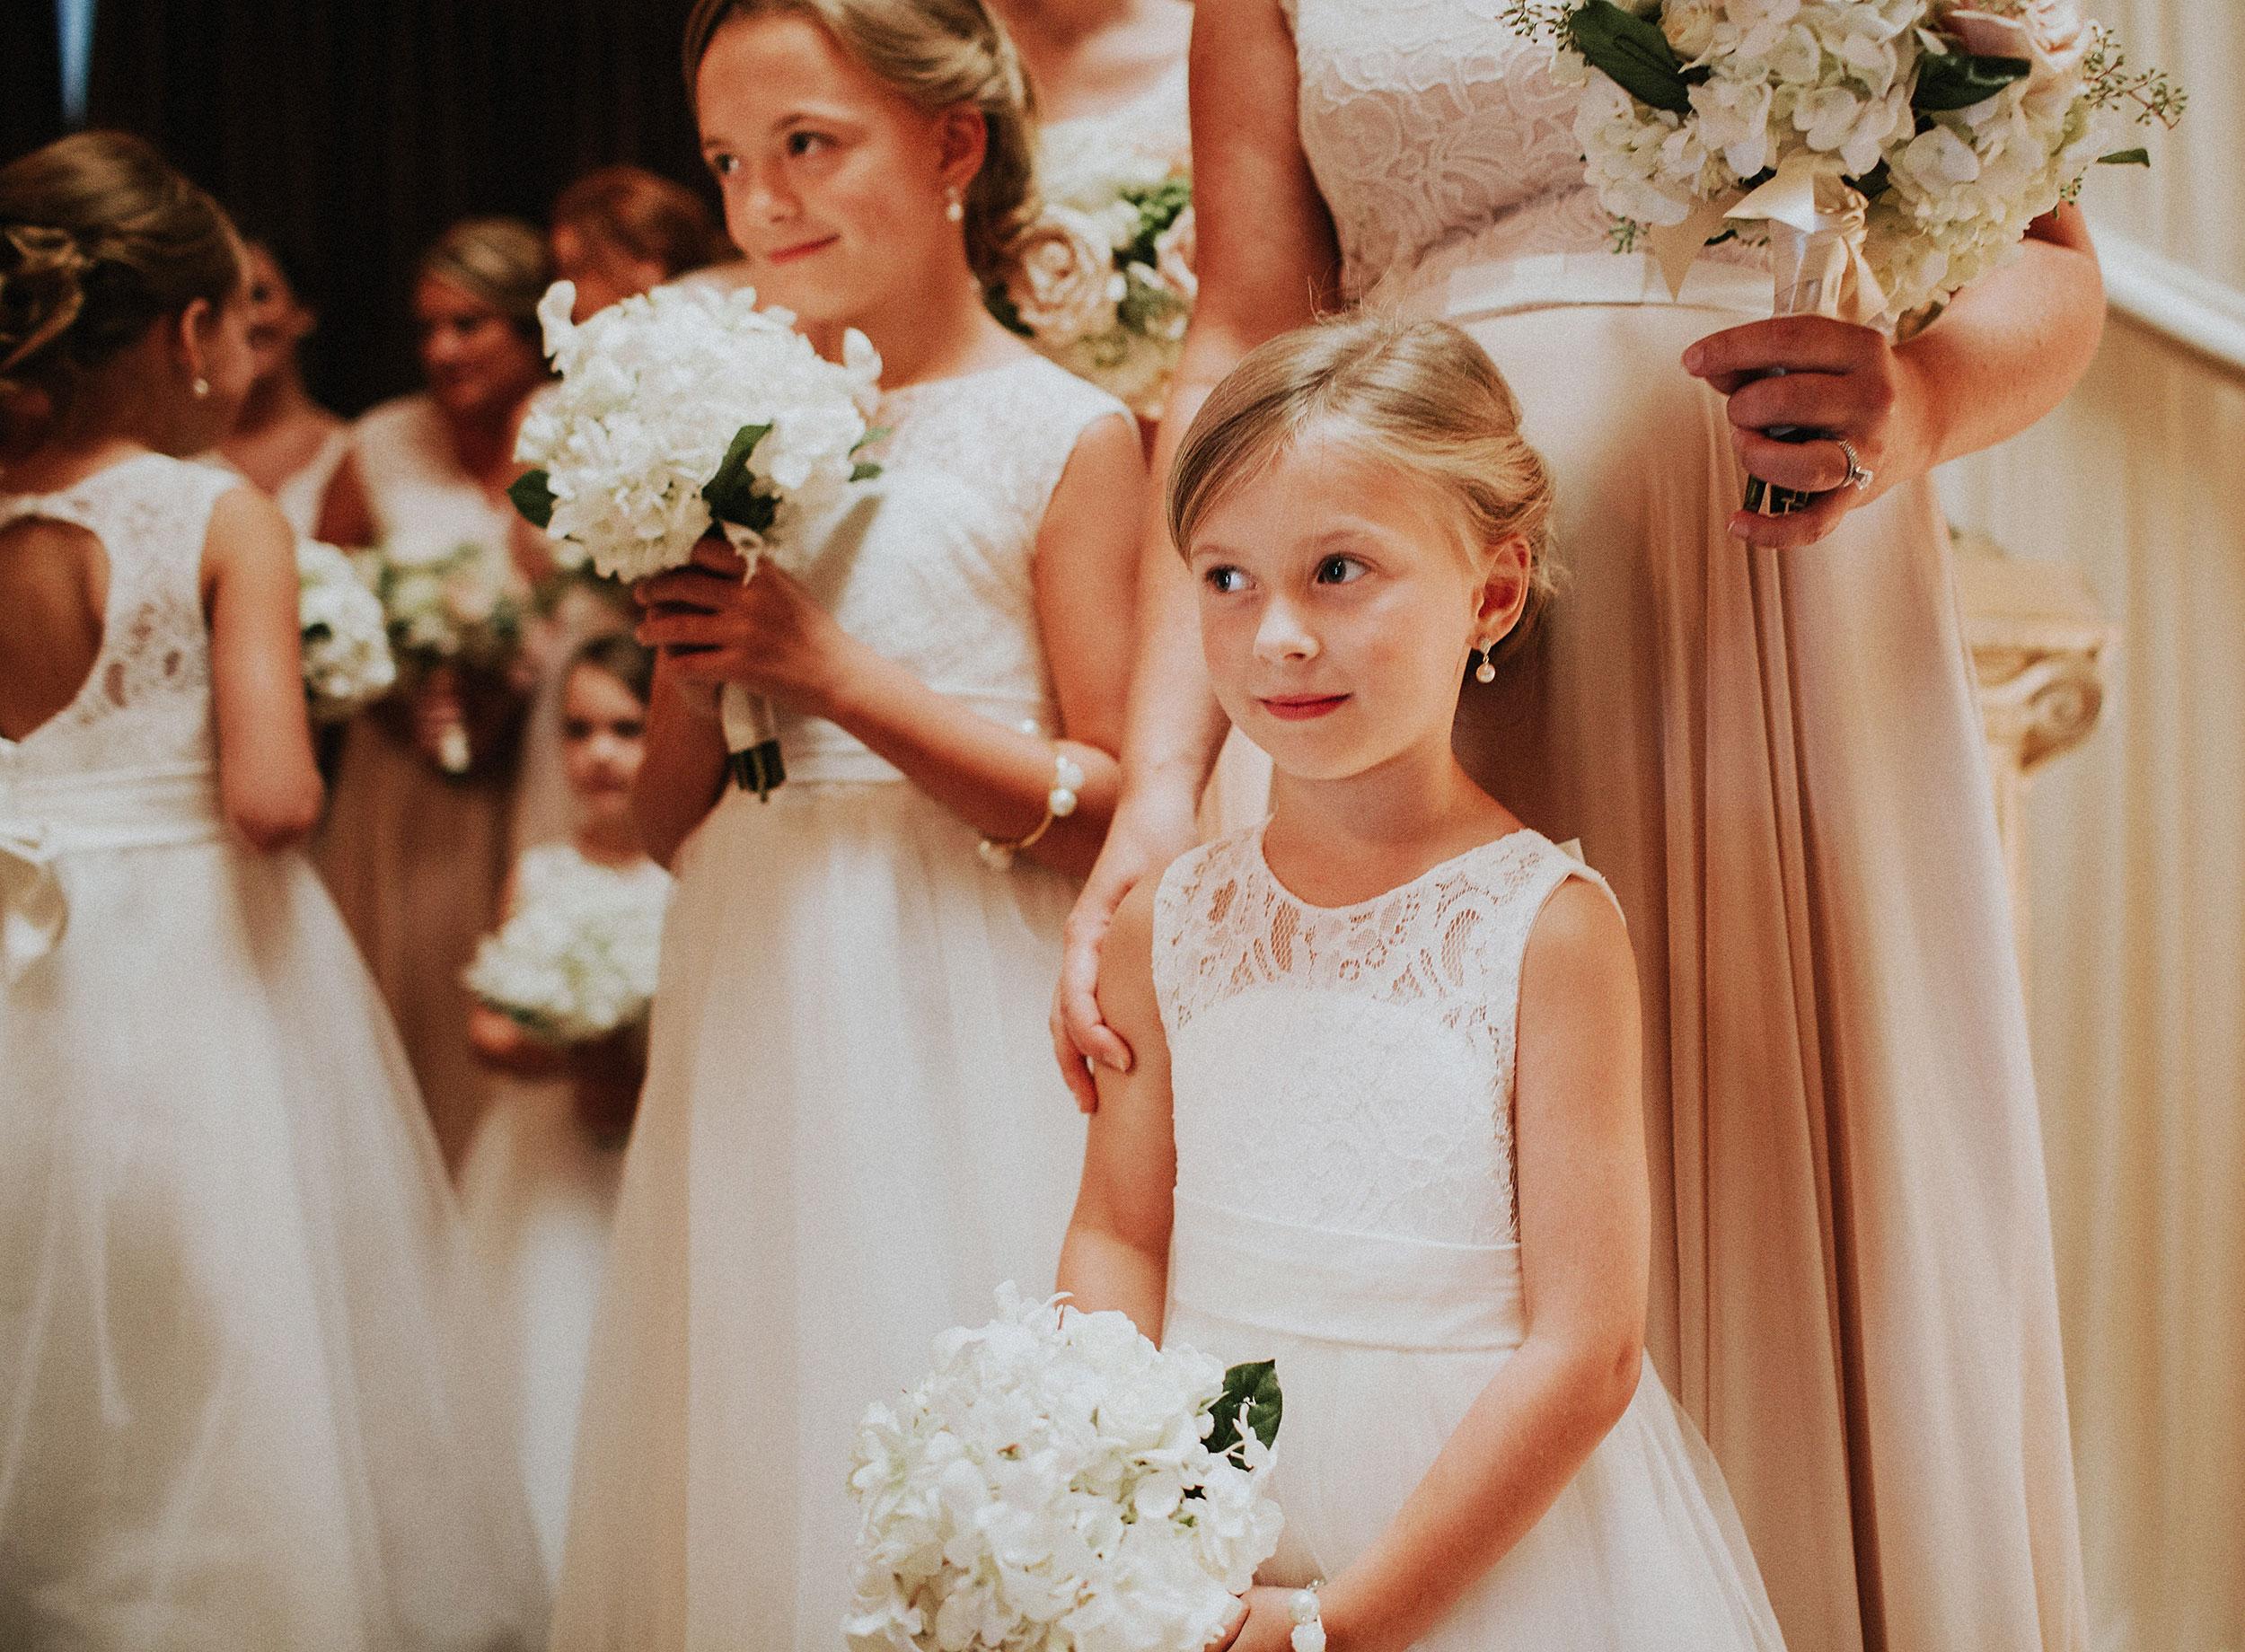 olmsted-wedding-louisville-kentucky-022.JPG